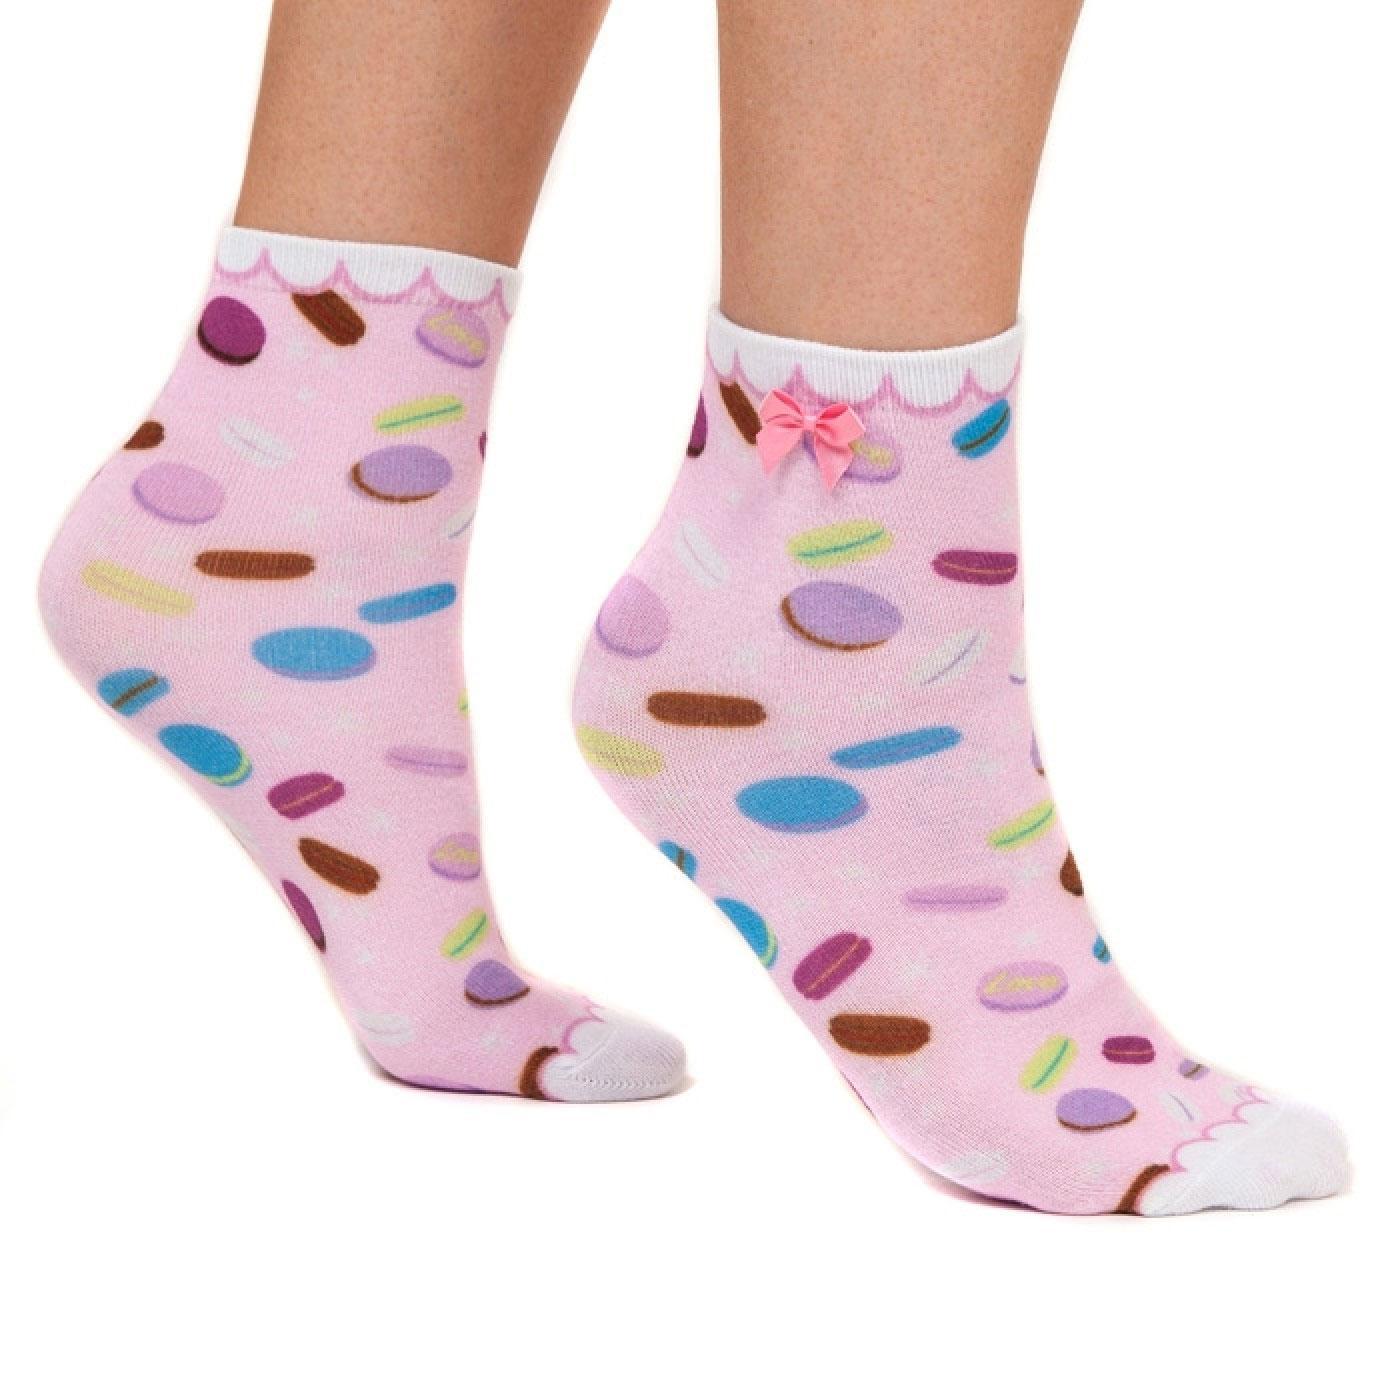 Sweet Treats IRREGULAR CHOICE Retro Macaron Socks